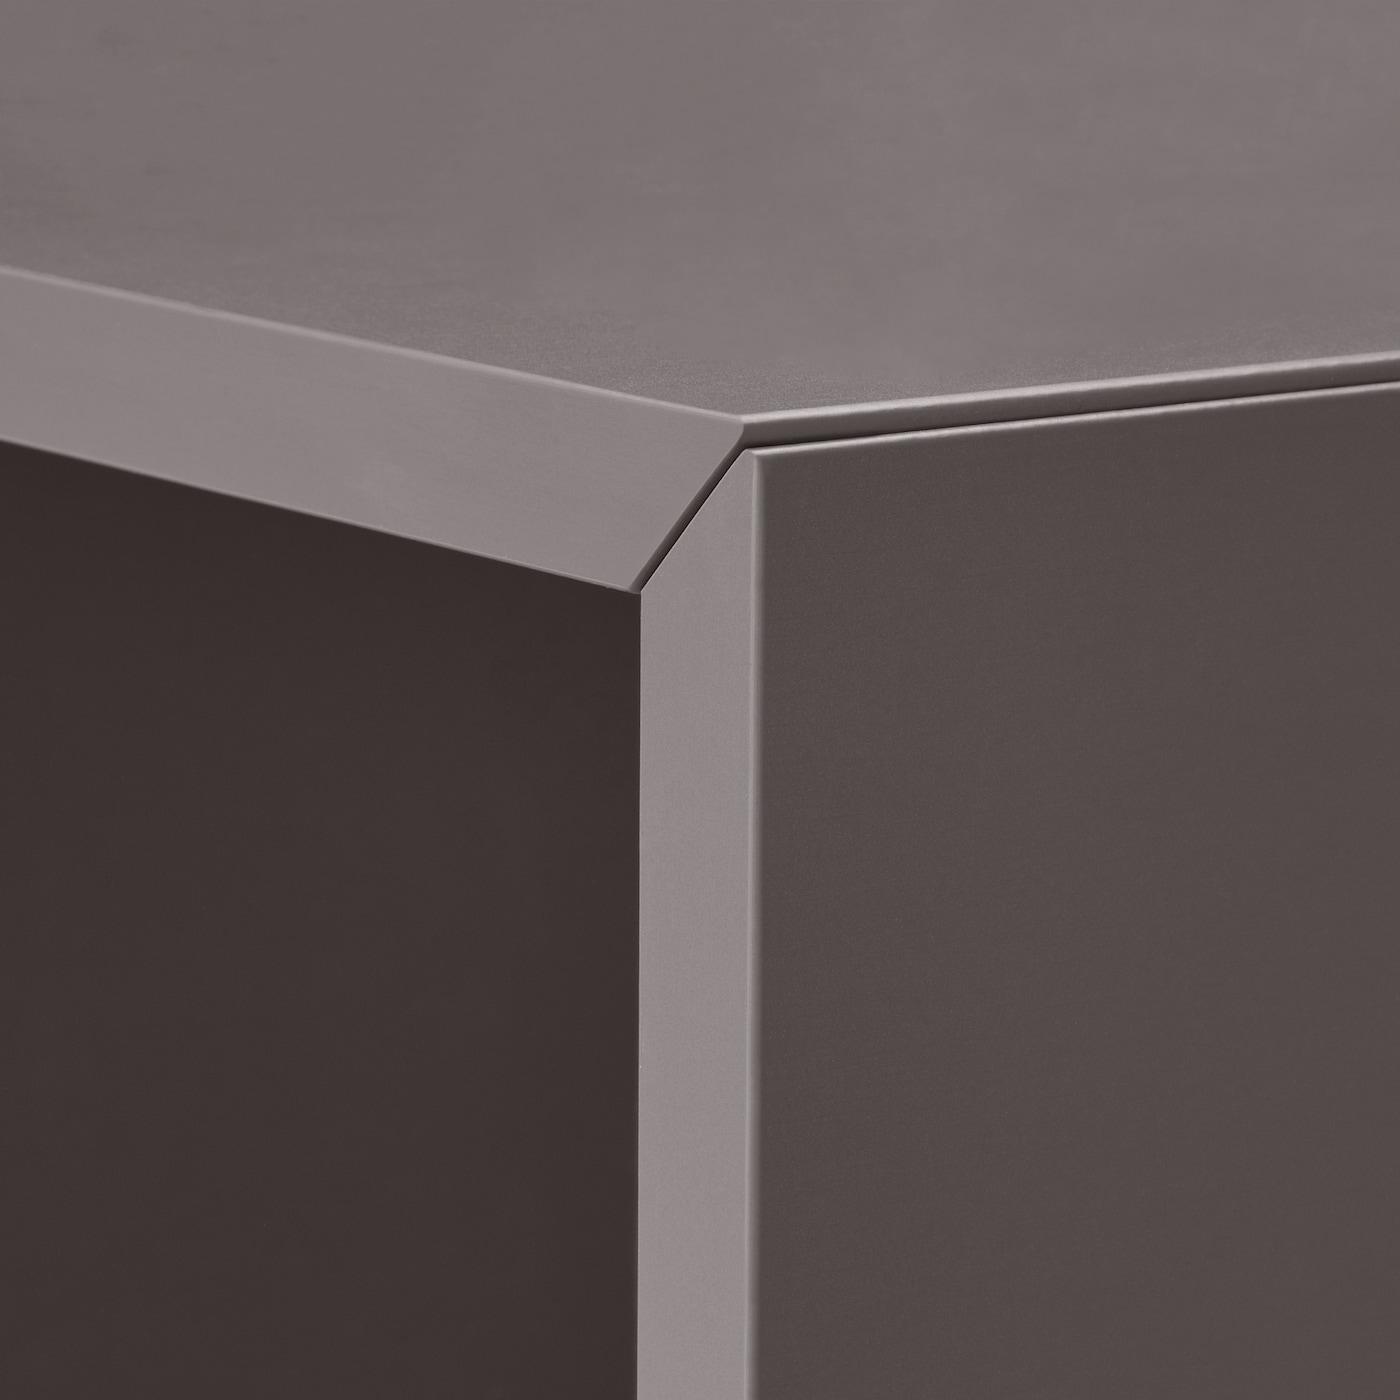 EKET Regalelement, wandmontiert dunkelgrau 35 cm 25 cm 35 cm